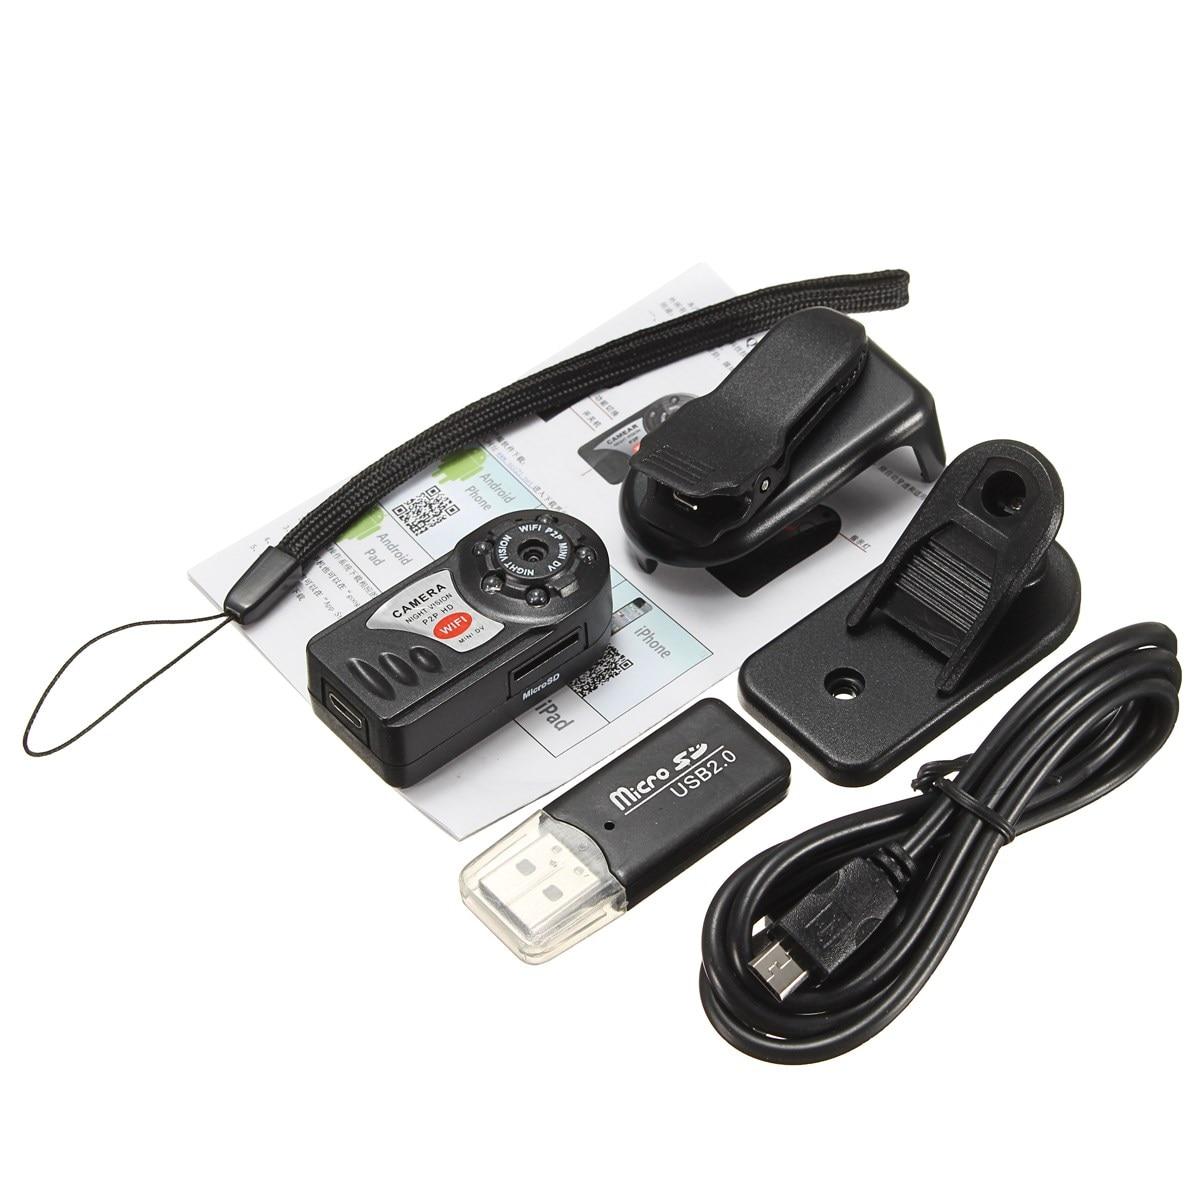 new 1 set 480p wireless wifi p2p mini cam ip surveillance camera for iphone android da ir night. Black Bedroom Furniture Sets. Home Design Ideas